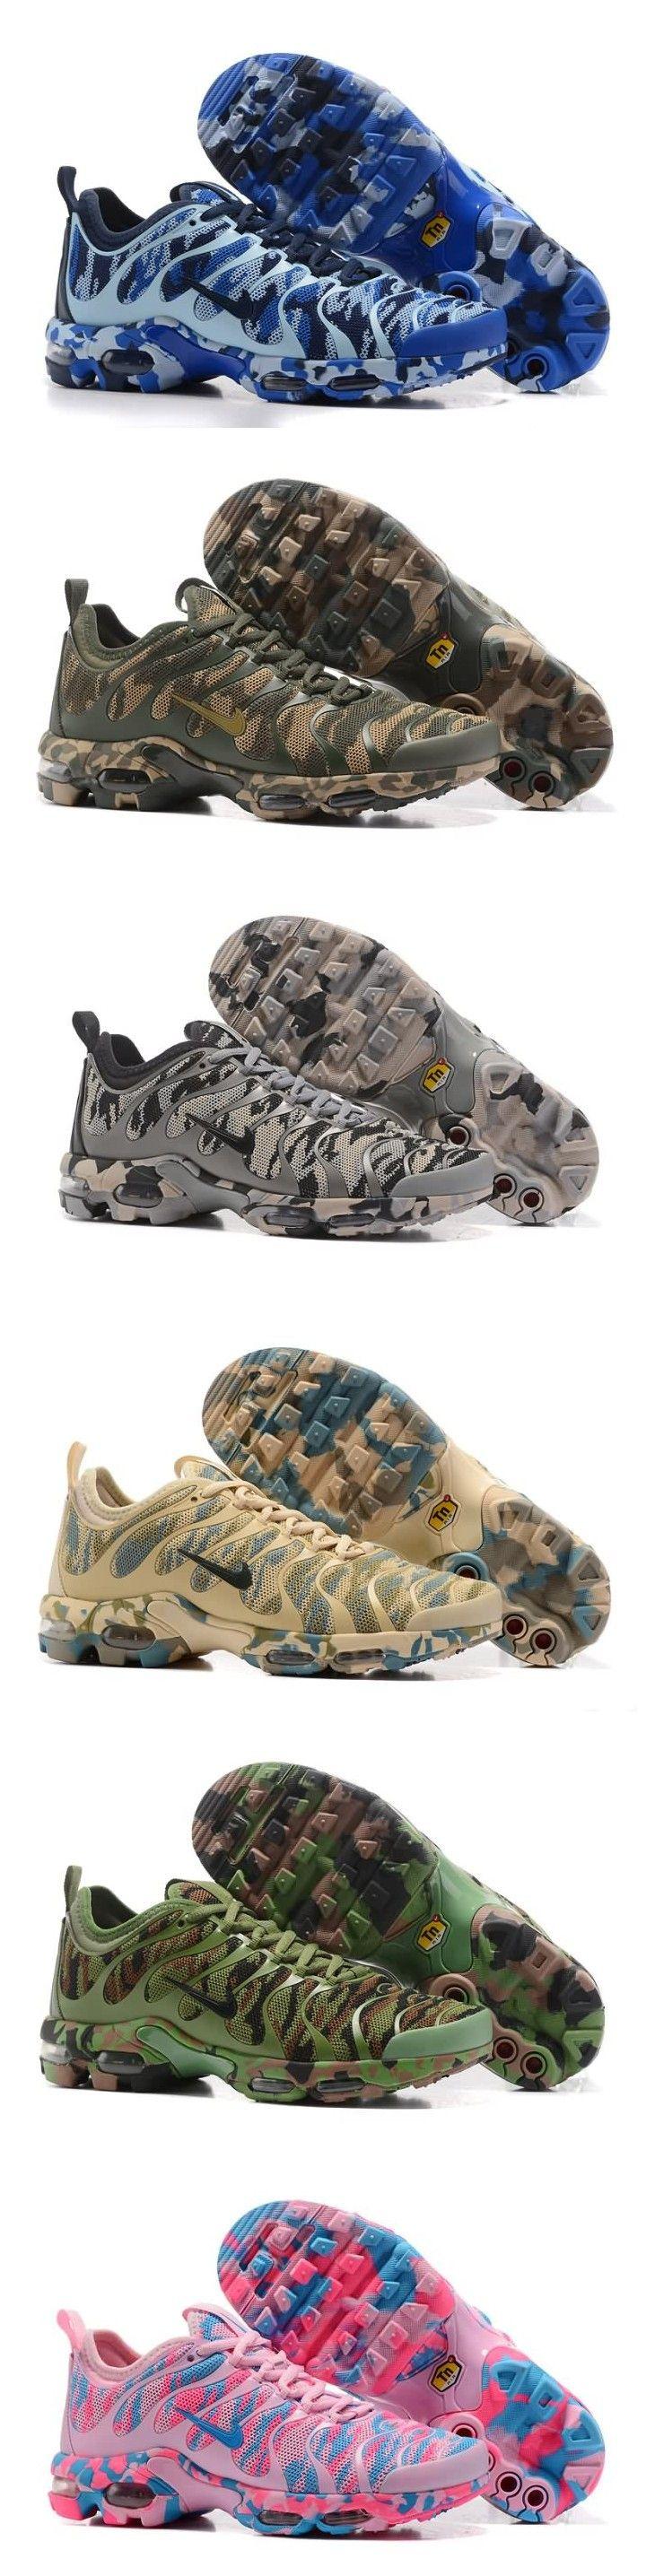 Nike Air Max Plus TN Ultra Camouflage Unisex shoes Free Shipping 36-46  WhatsApp: